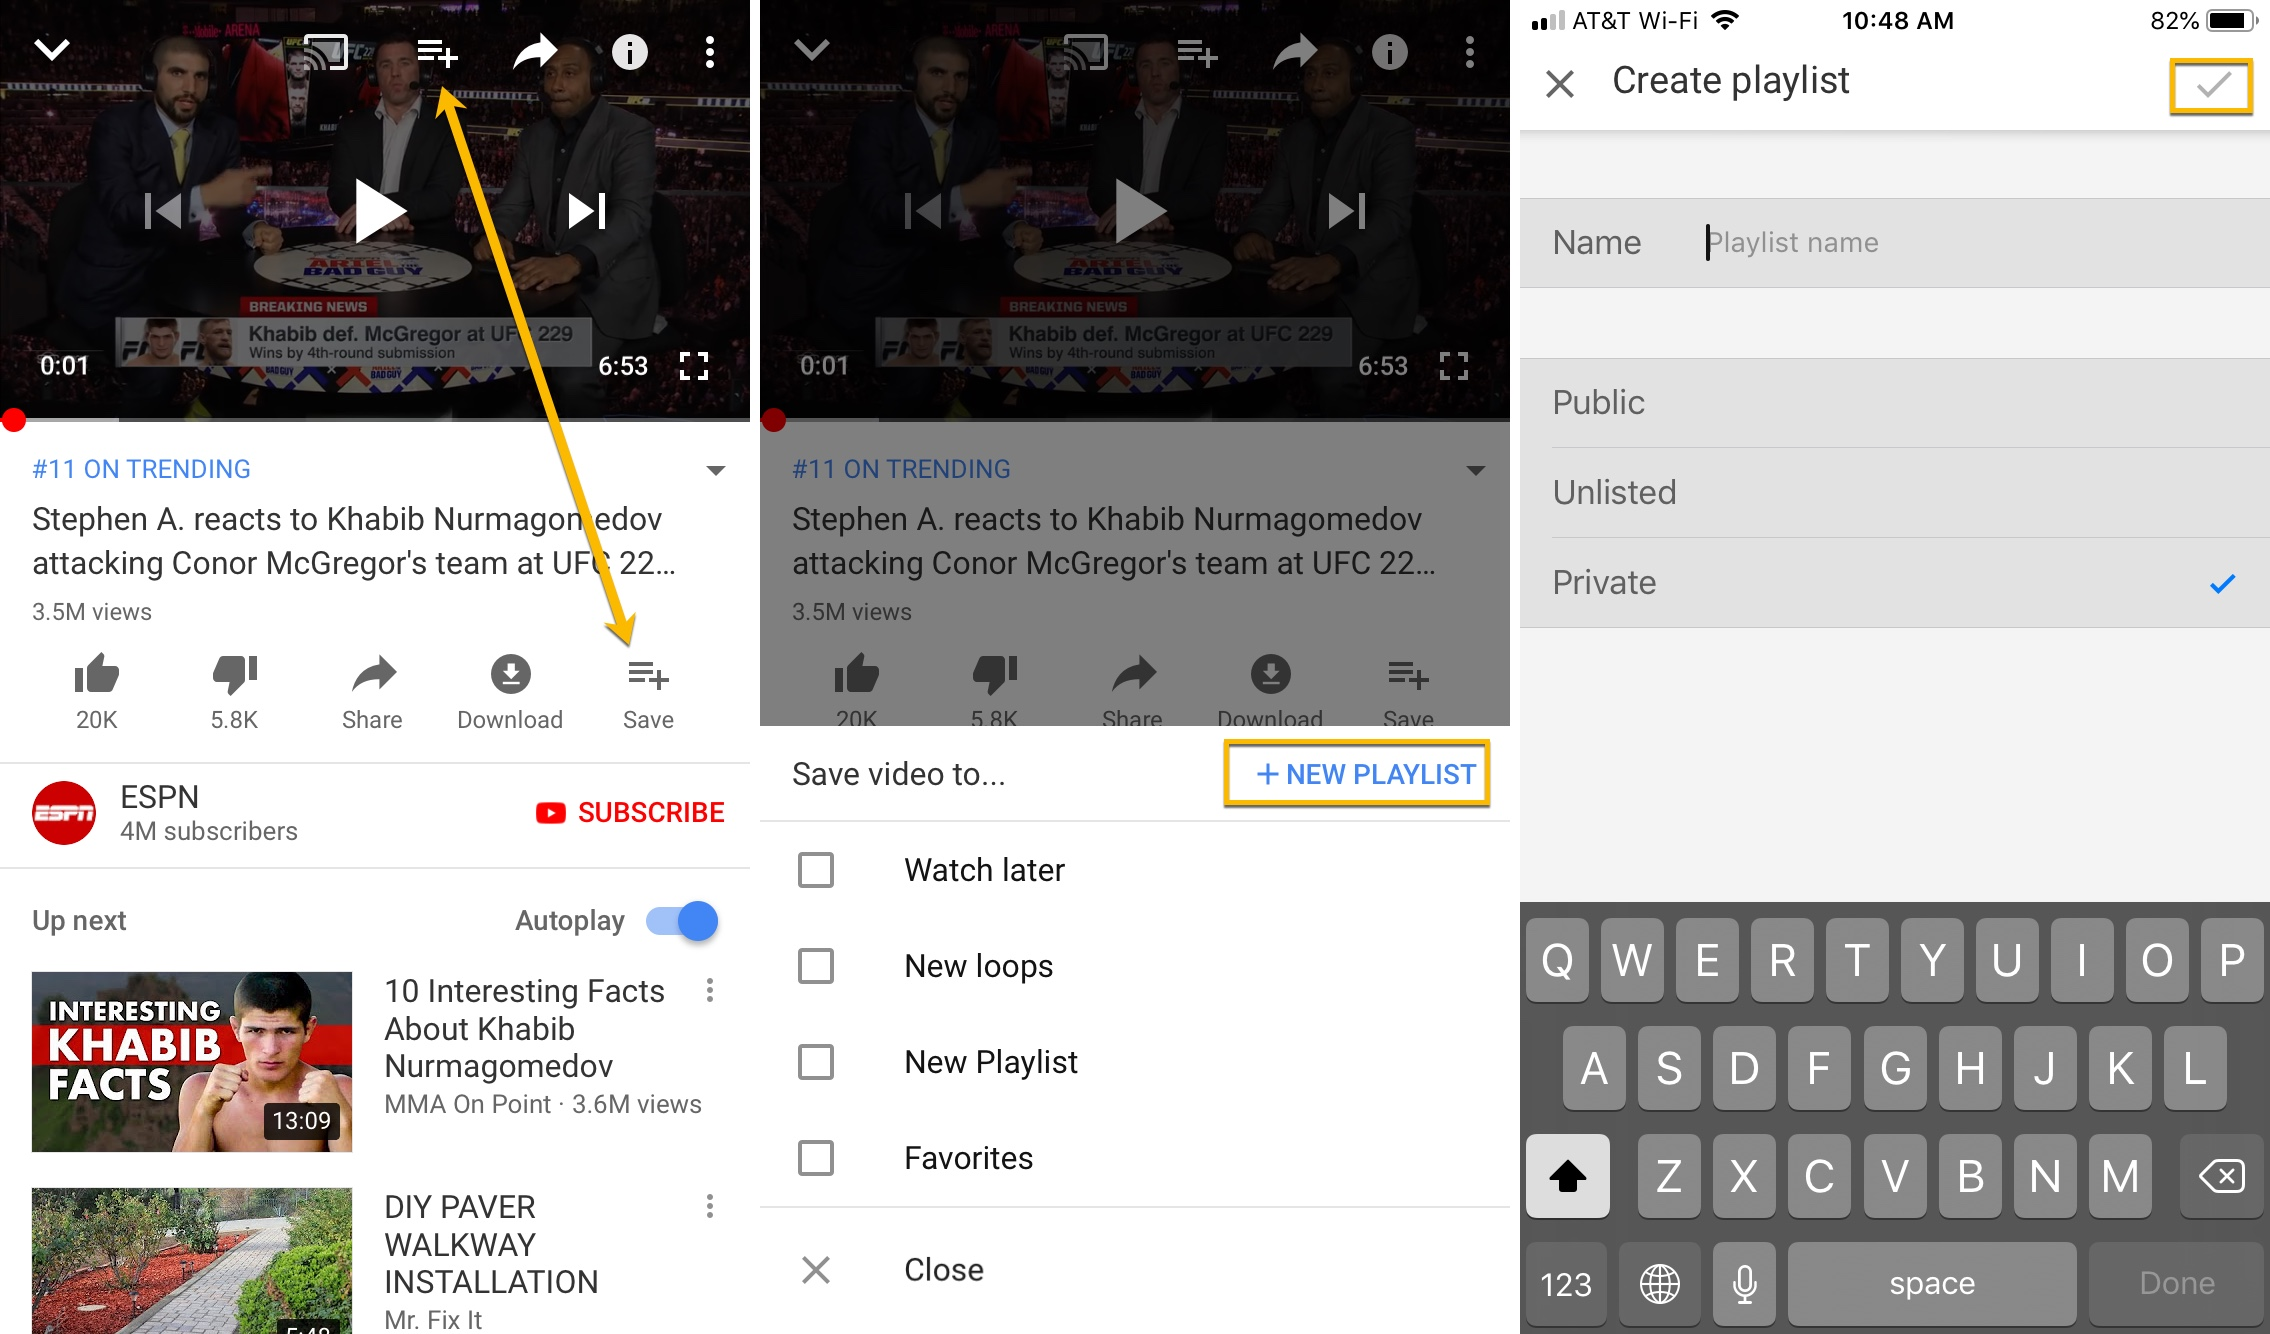 YouTube App iPhone New Playlist